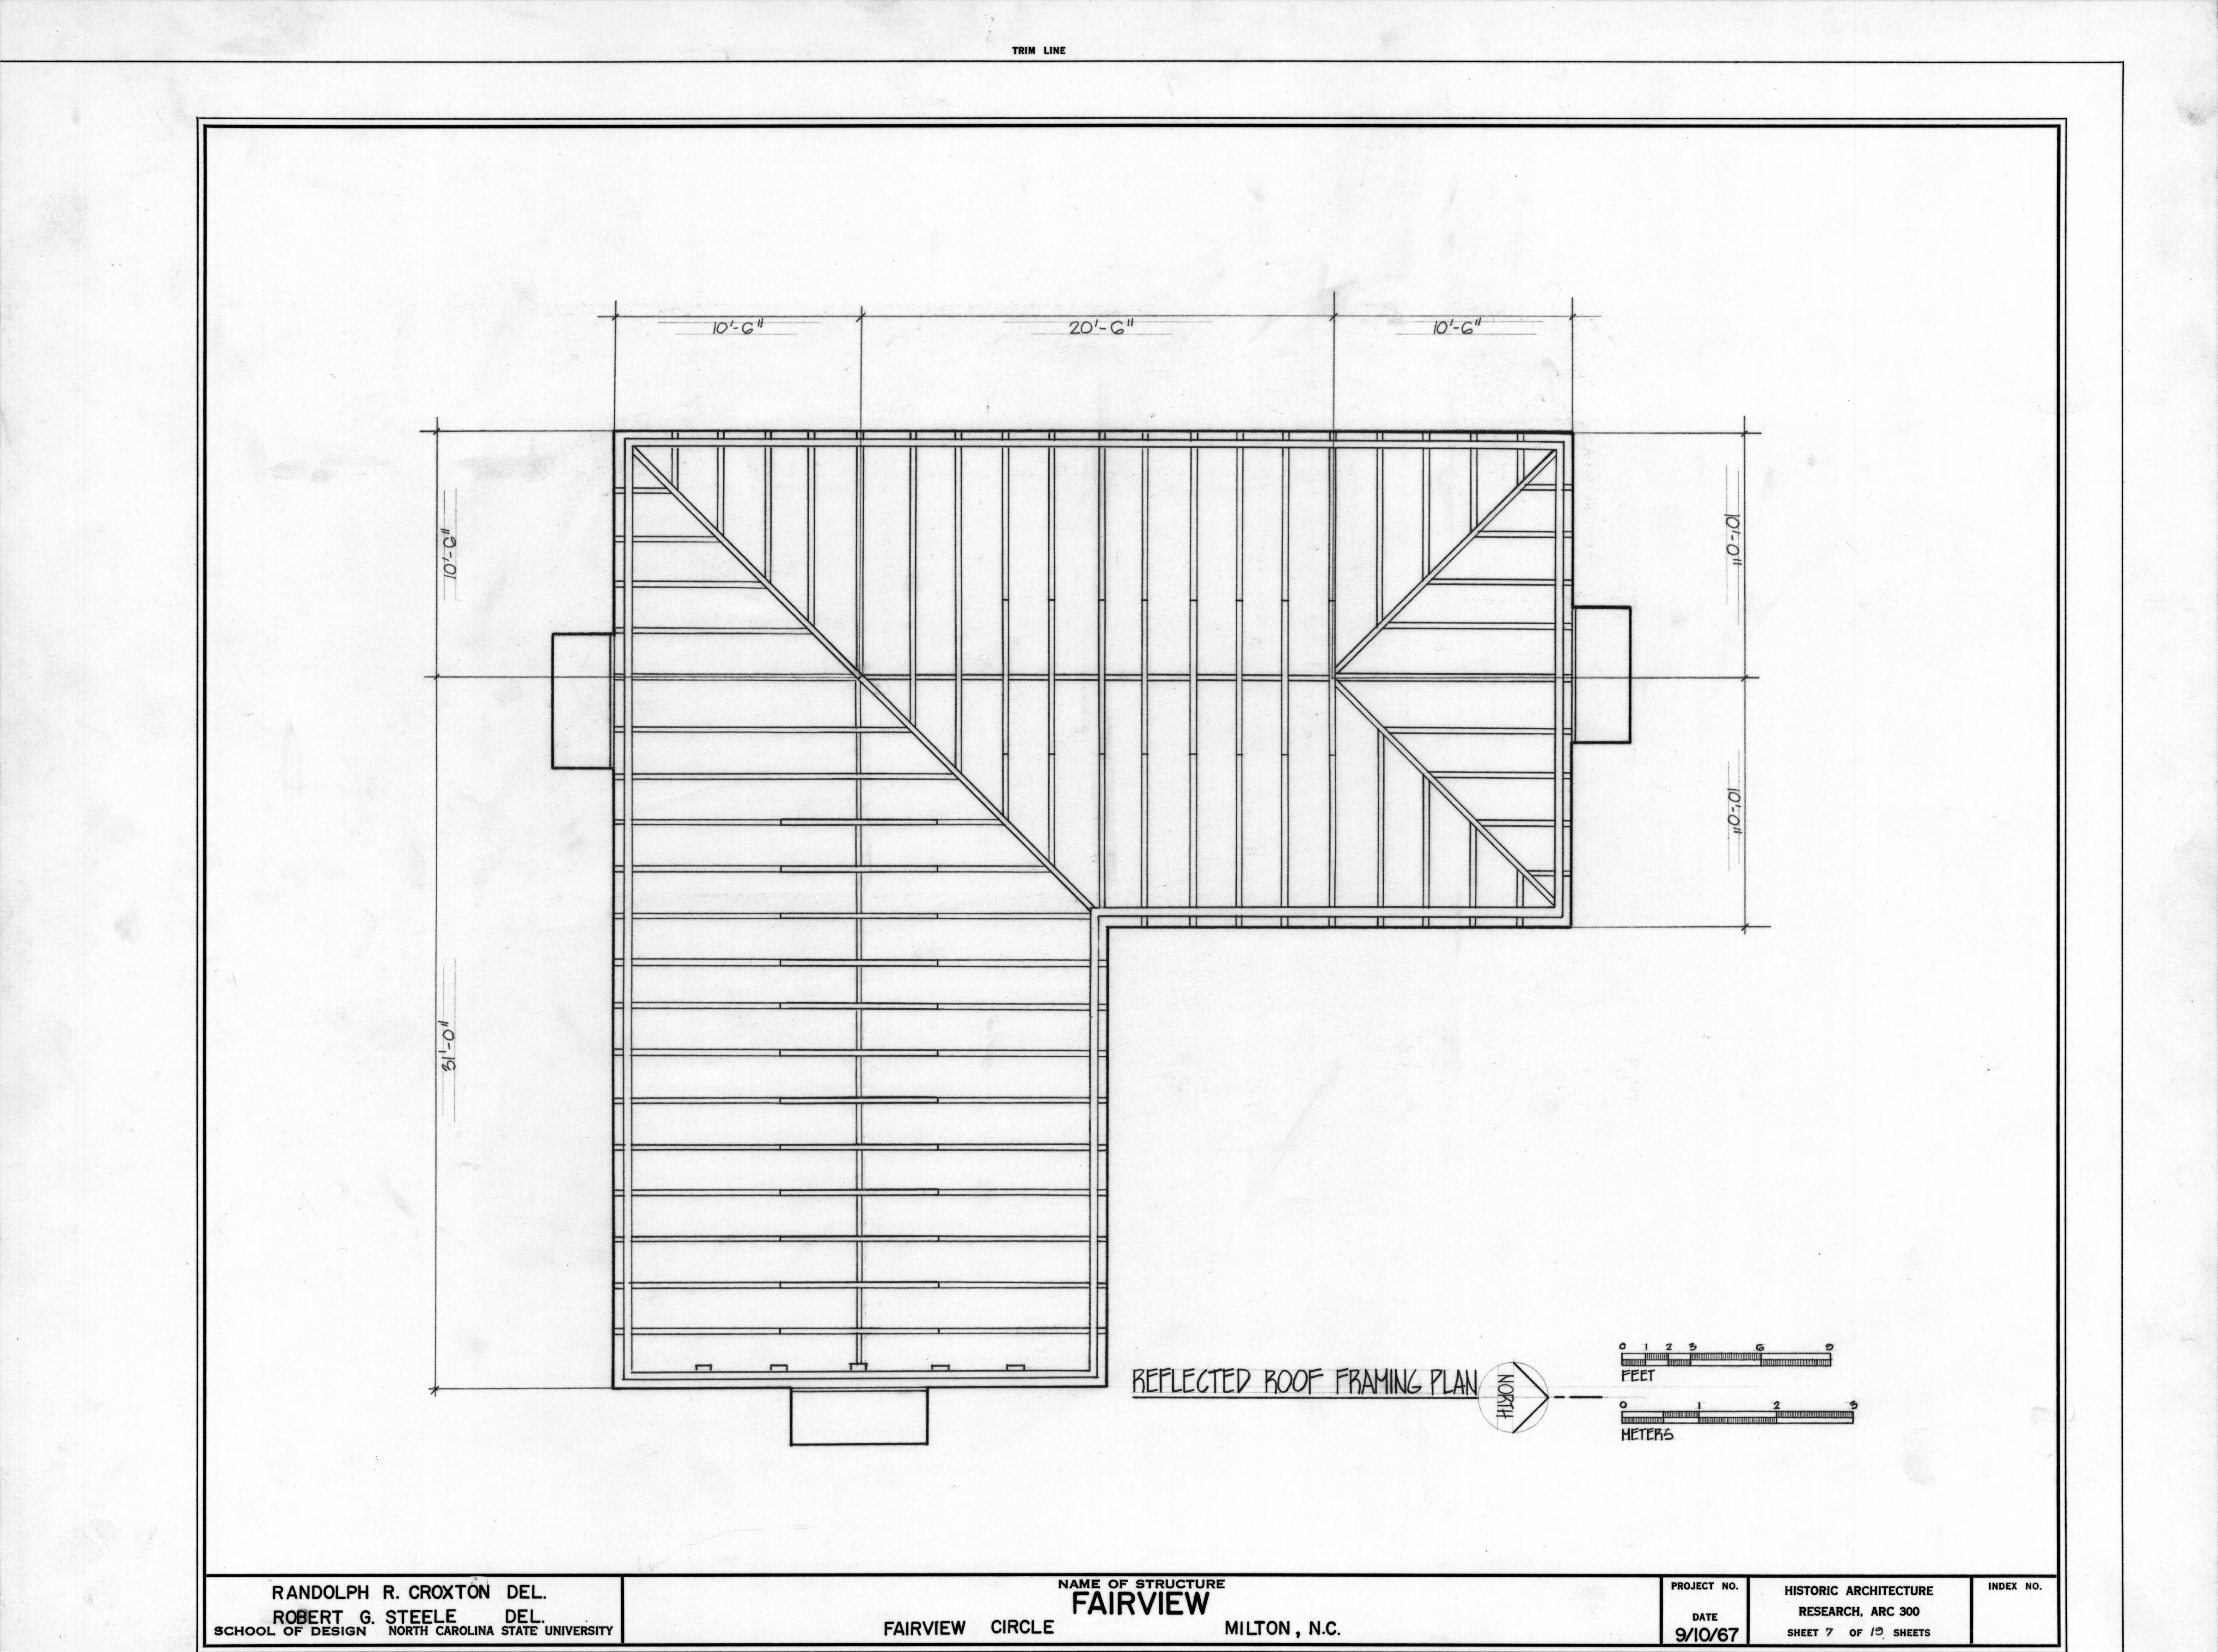 roof framing plan asa thomas house milton north a frame house plans sds plans